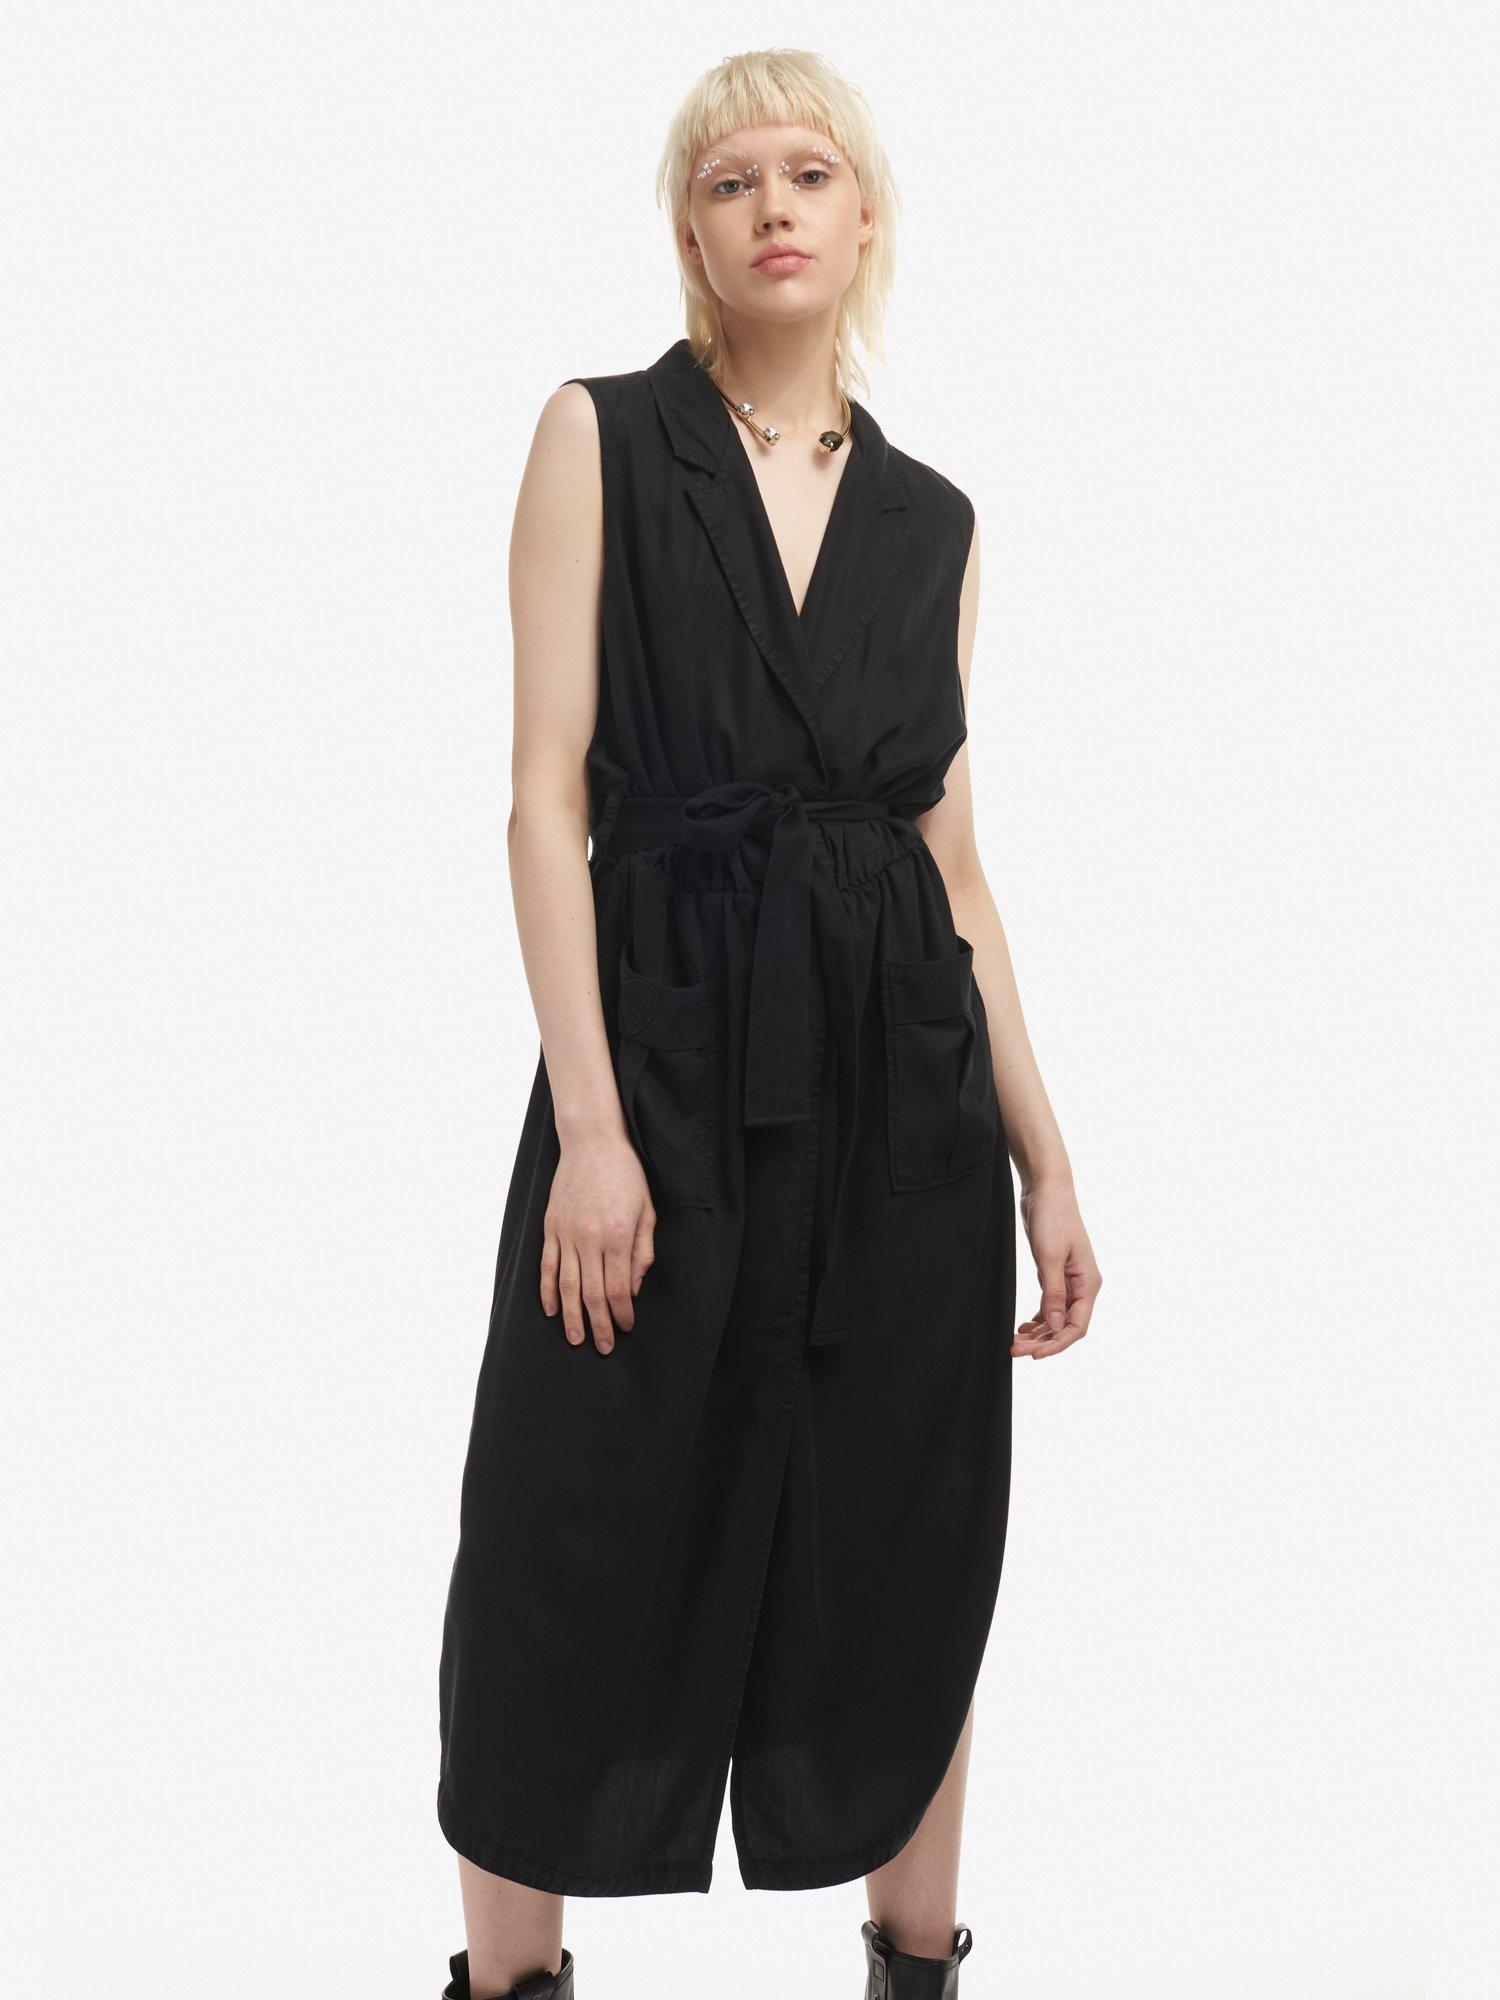 Blauer - SLEEVELESS DRESS - Black - Blauer